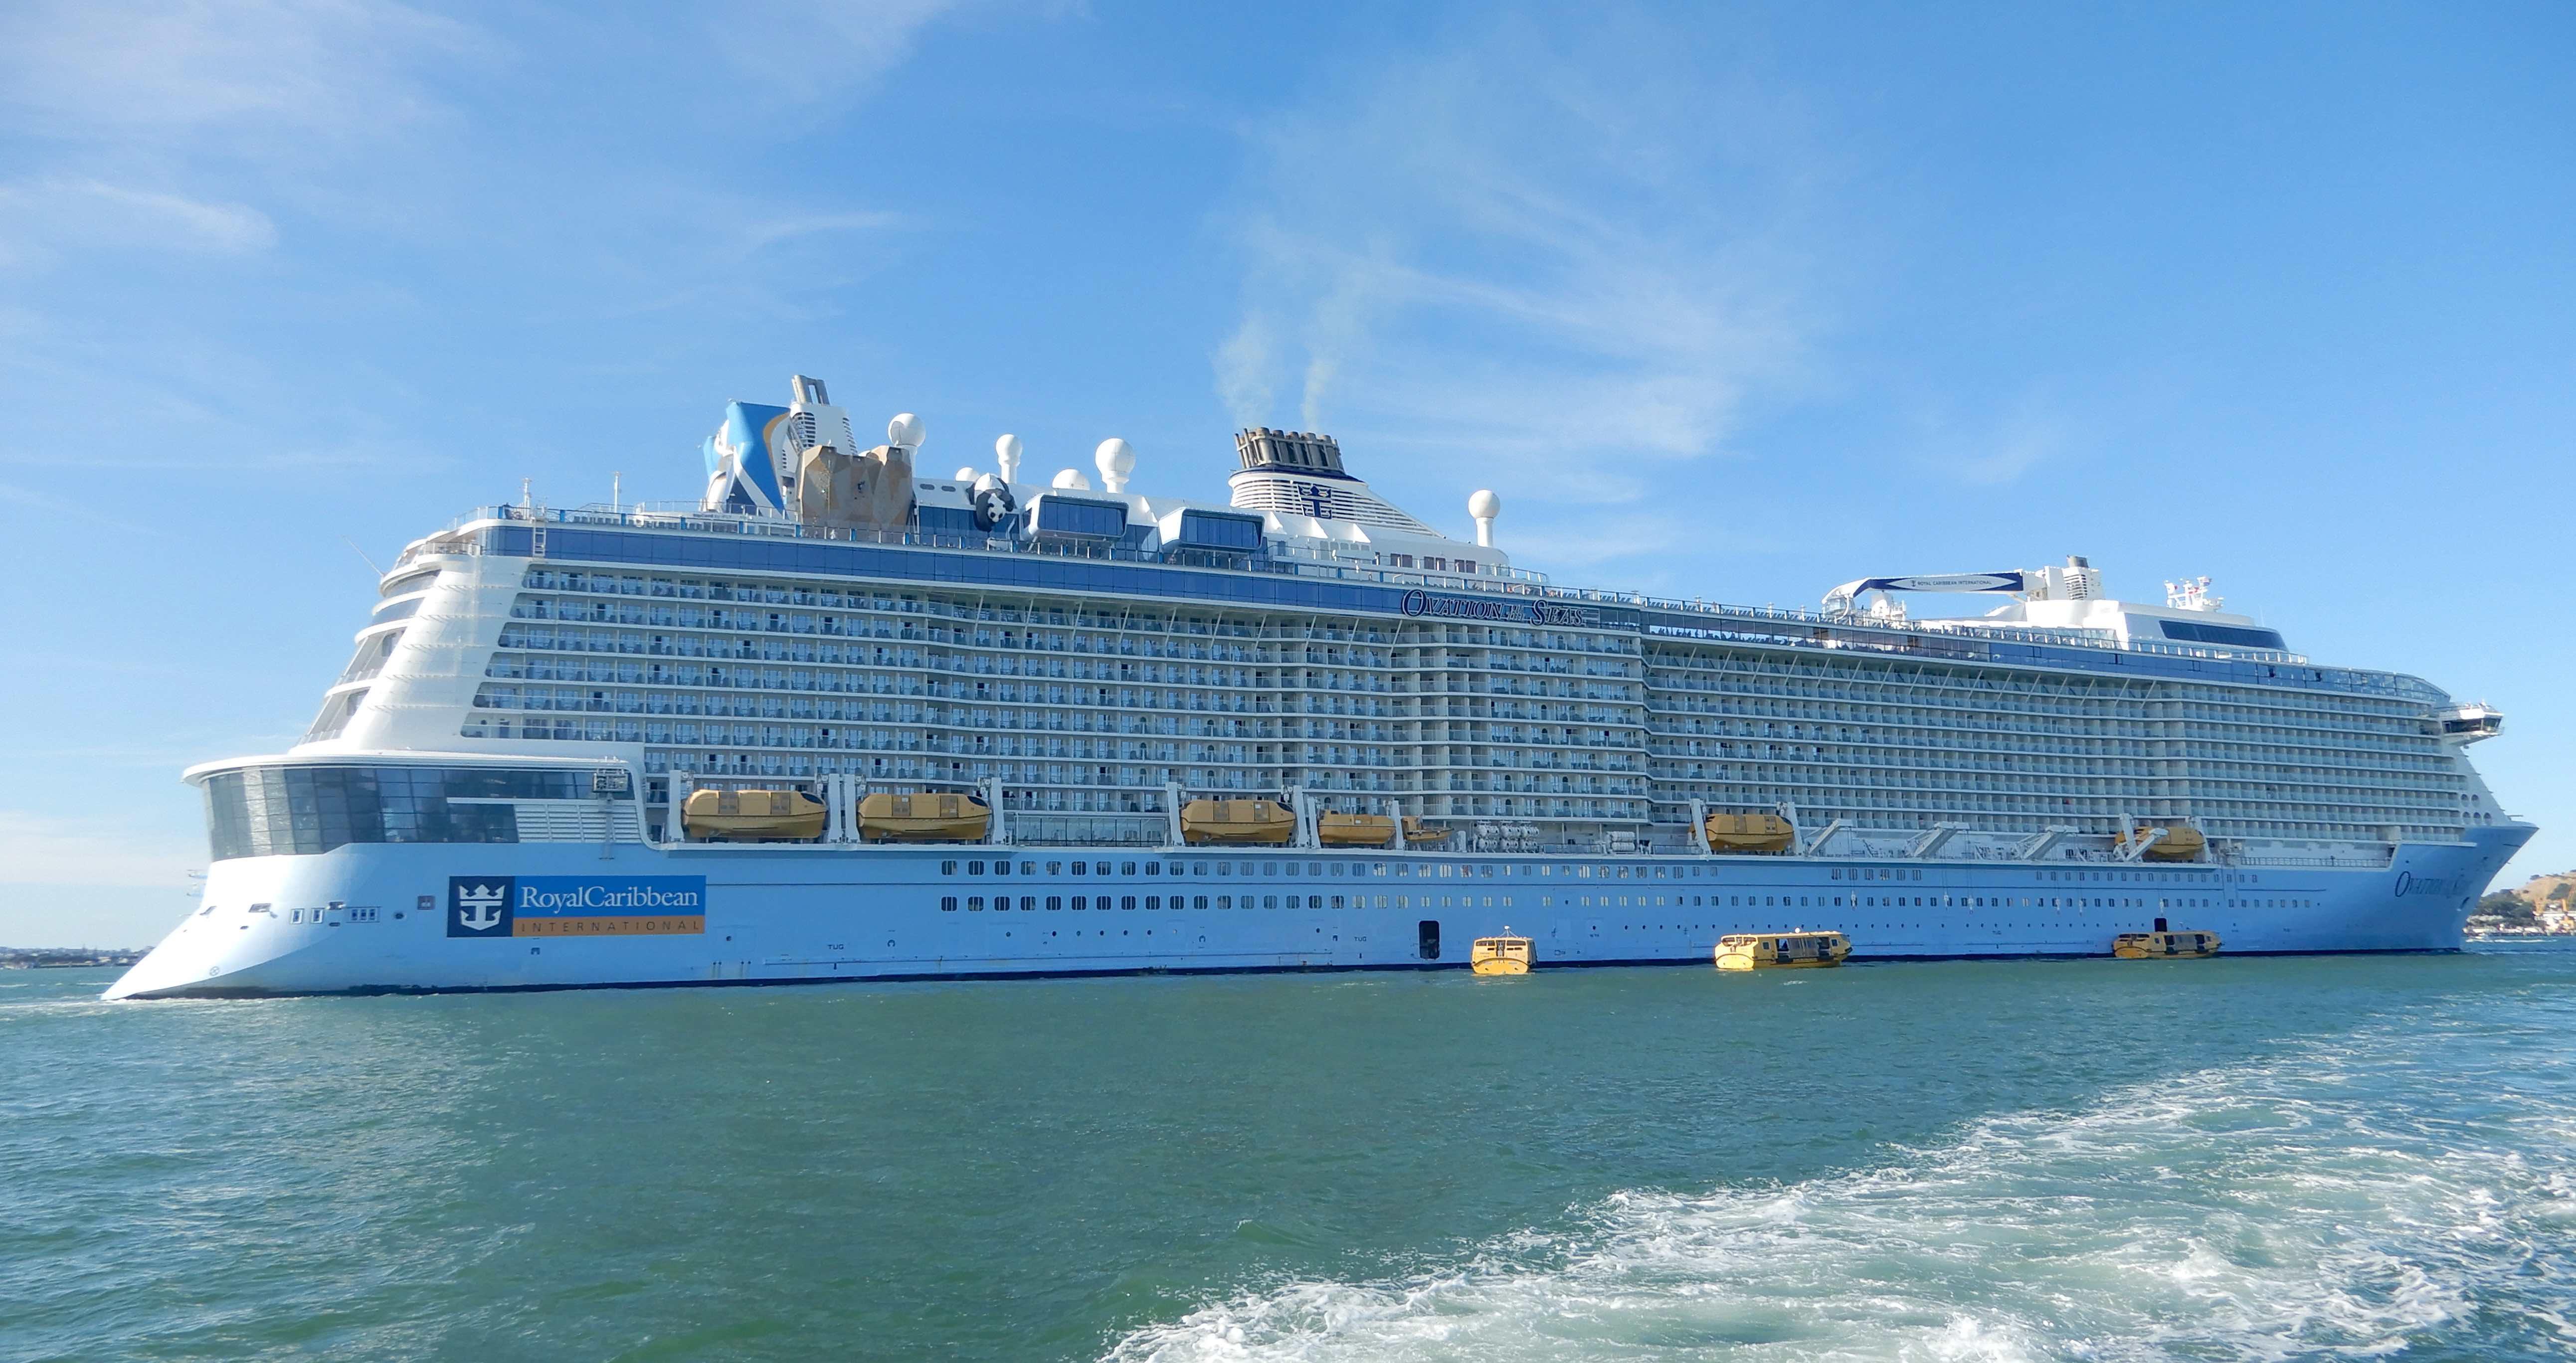 41.Ovation of the Seas